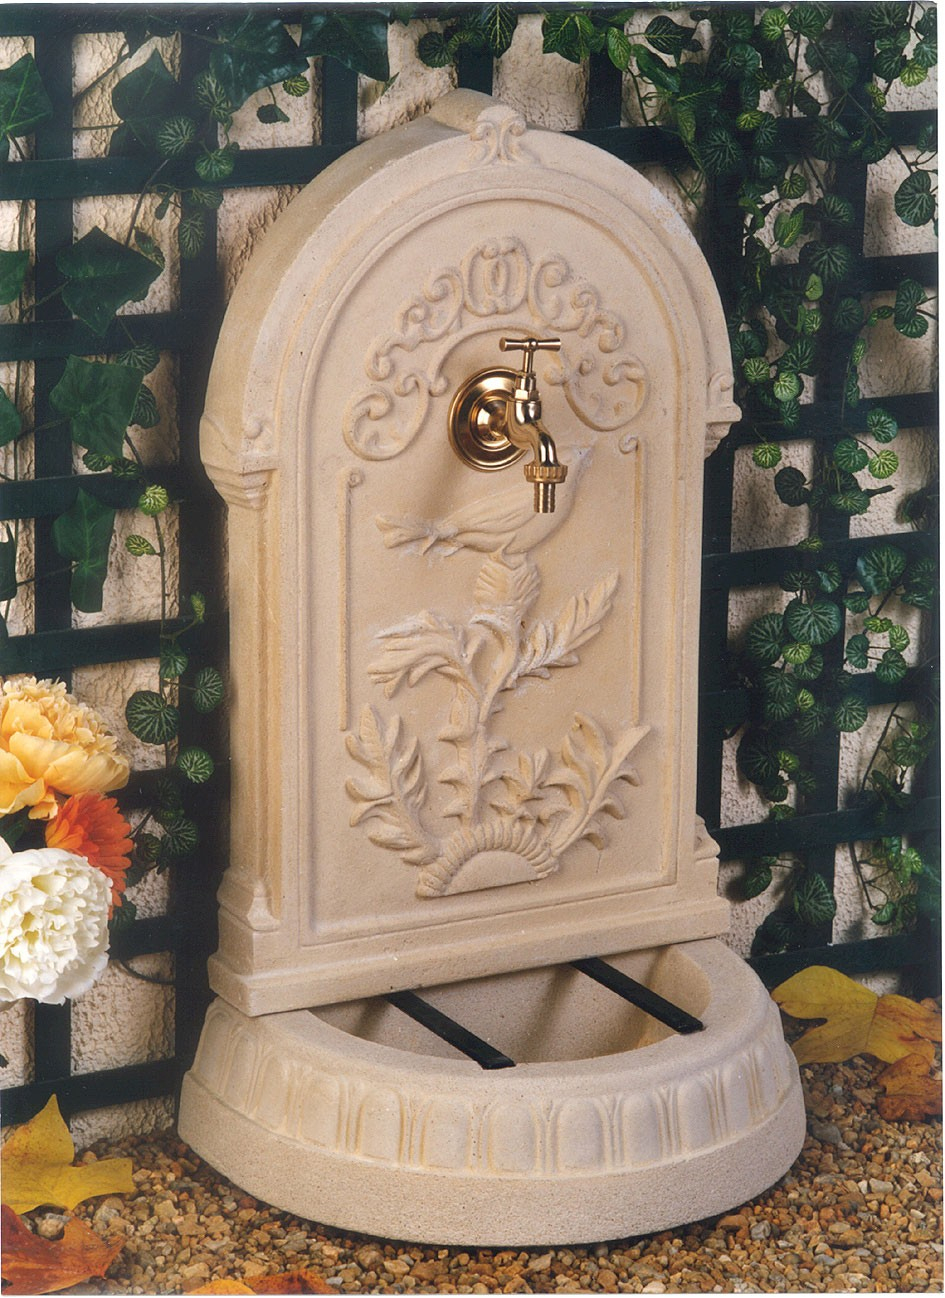 Fontaine De Jardin En Pierre Reconstituée Primevère 45 X 30 X 75 Cm à Fontaine De Jardin En Pierre Reconstituée